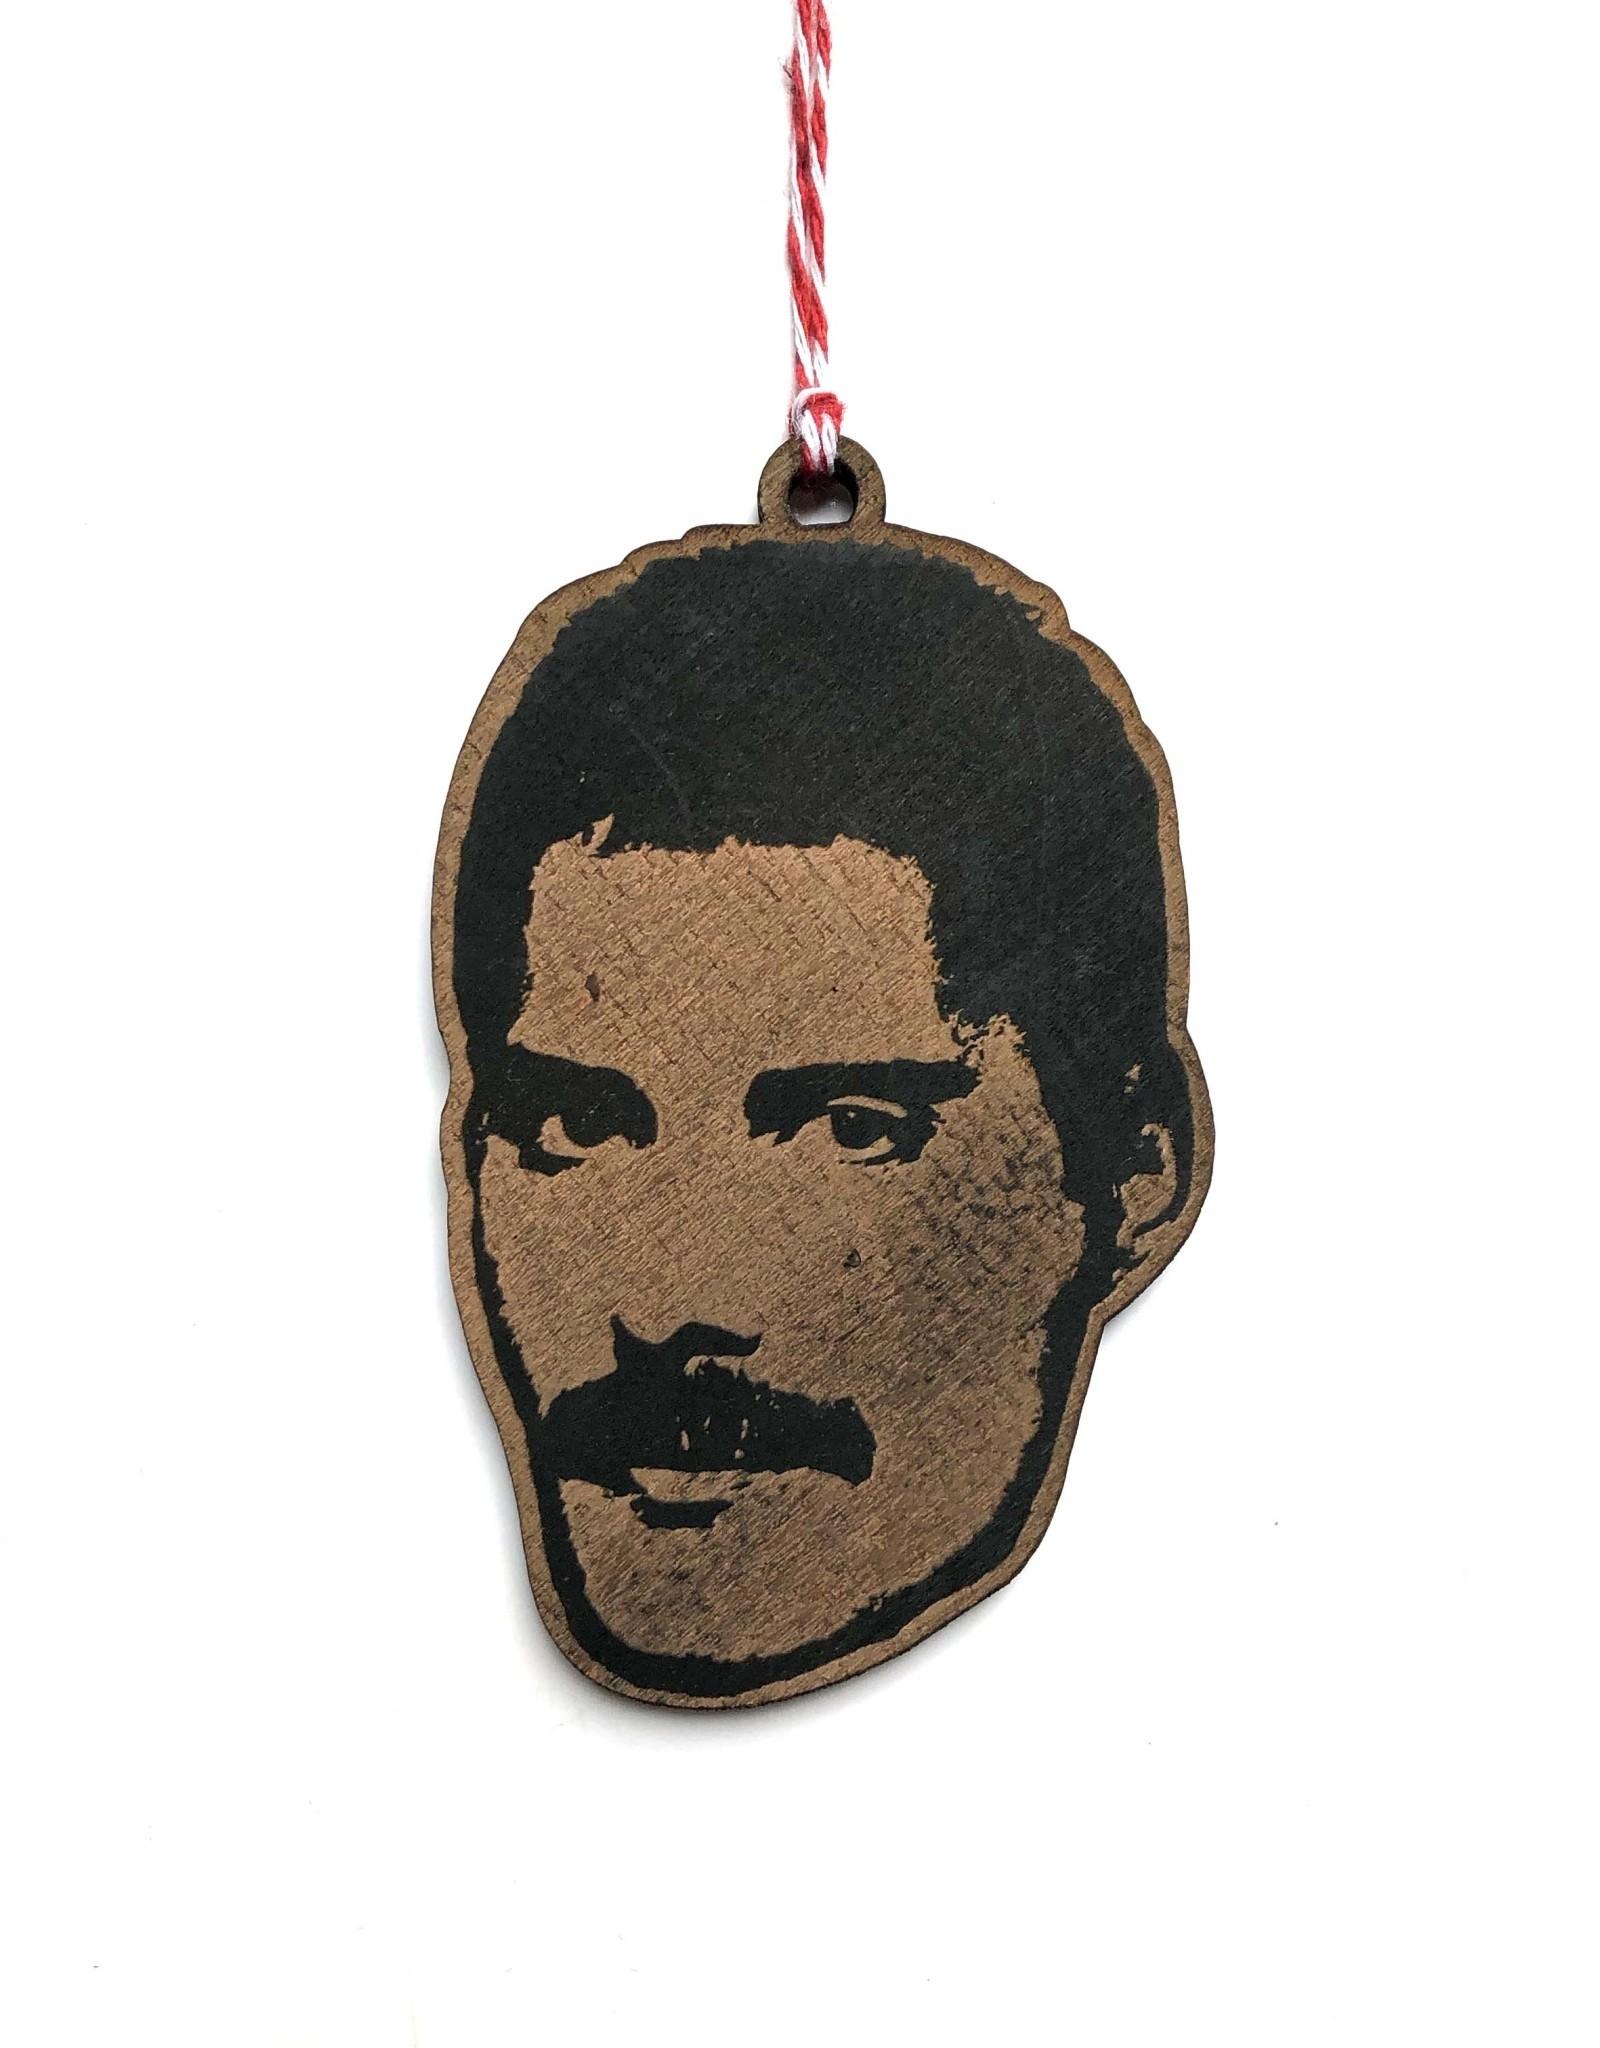 Letter Craft Freddie Mercury Wooden Ornament